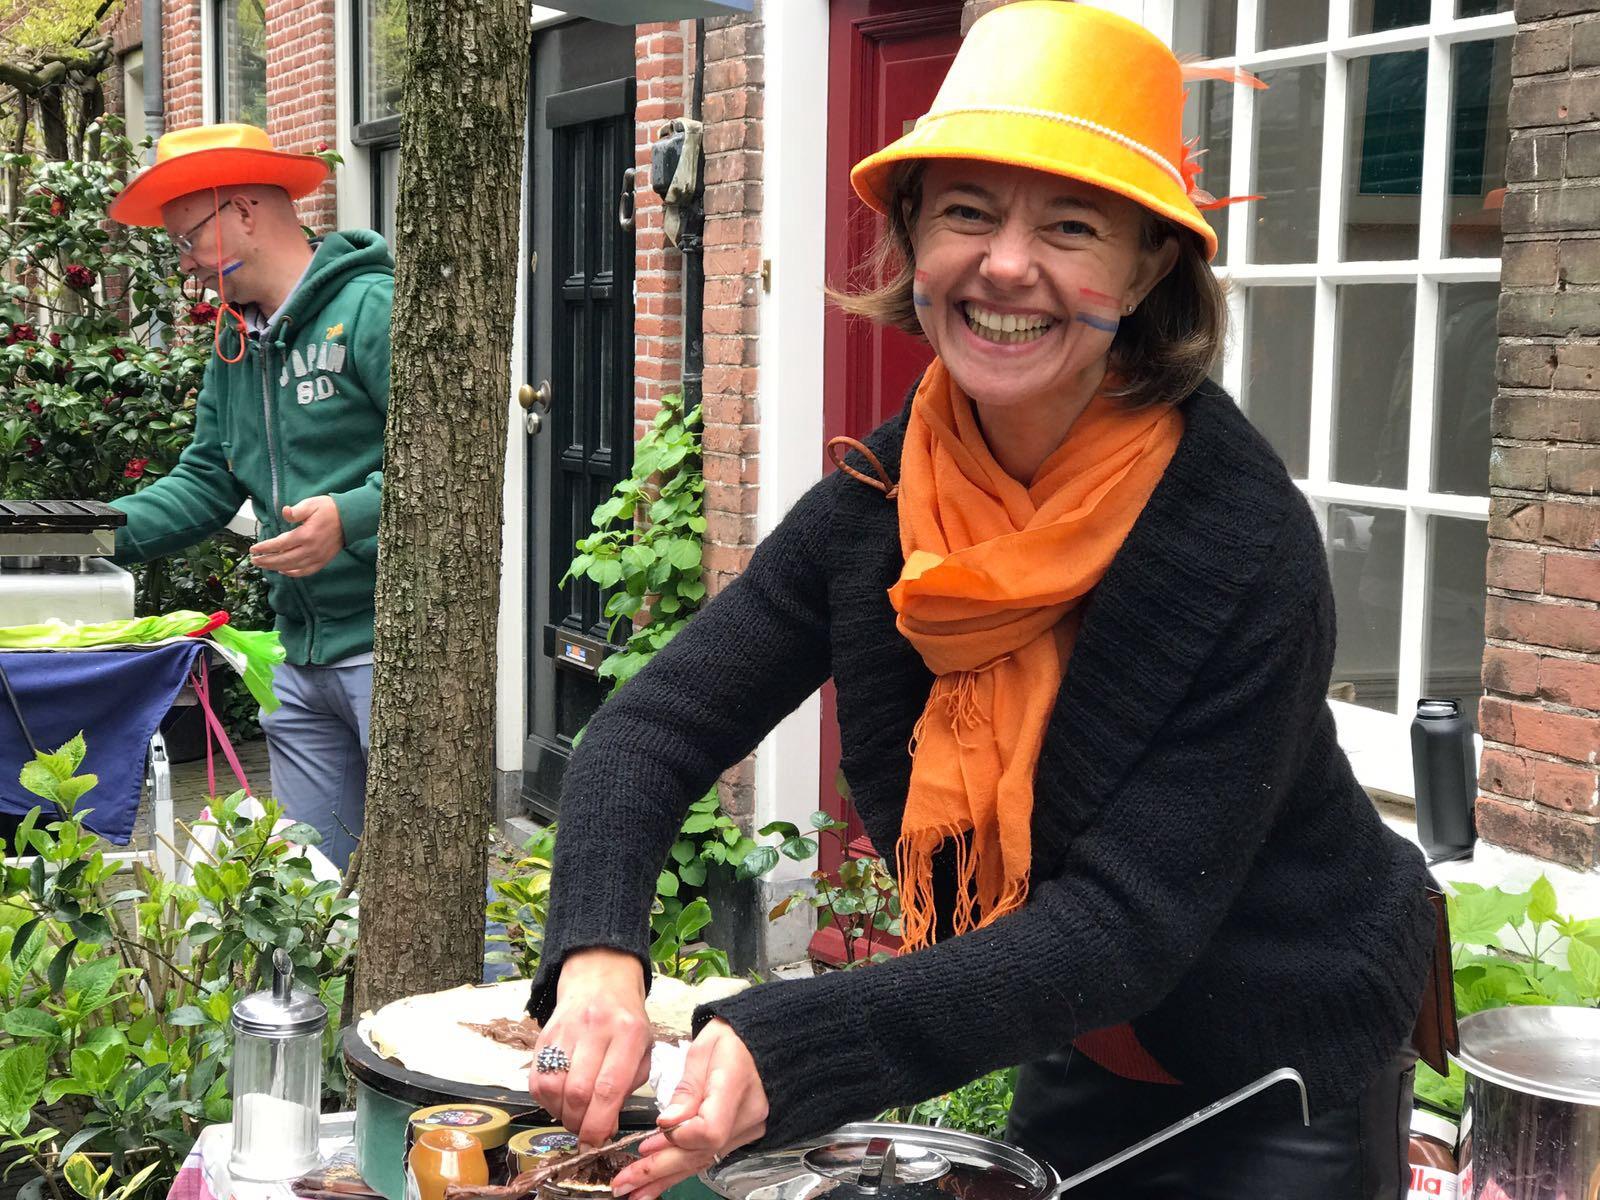 dating nederlanders in frankrijk christian dating website for free